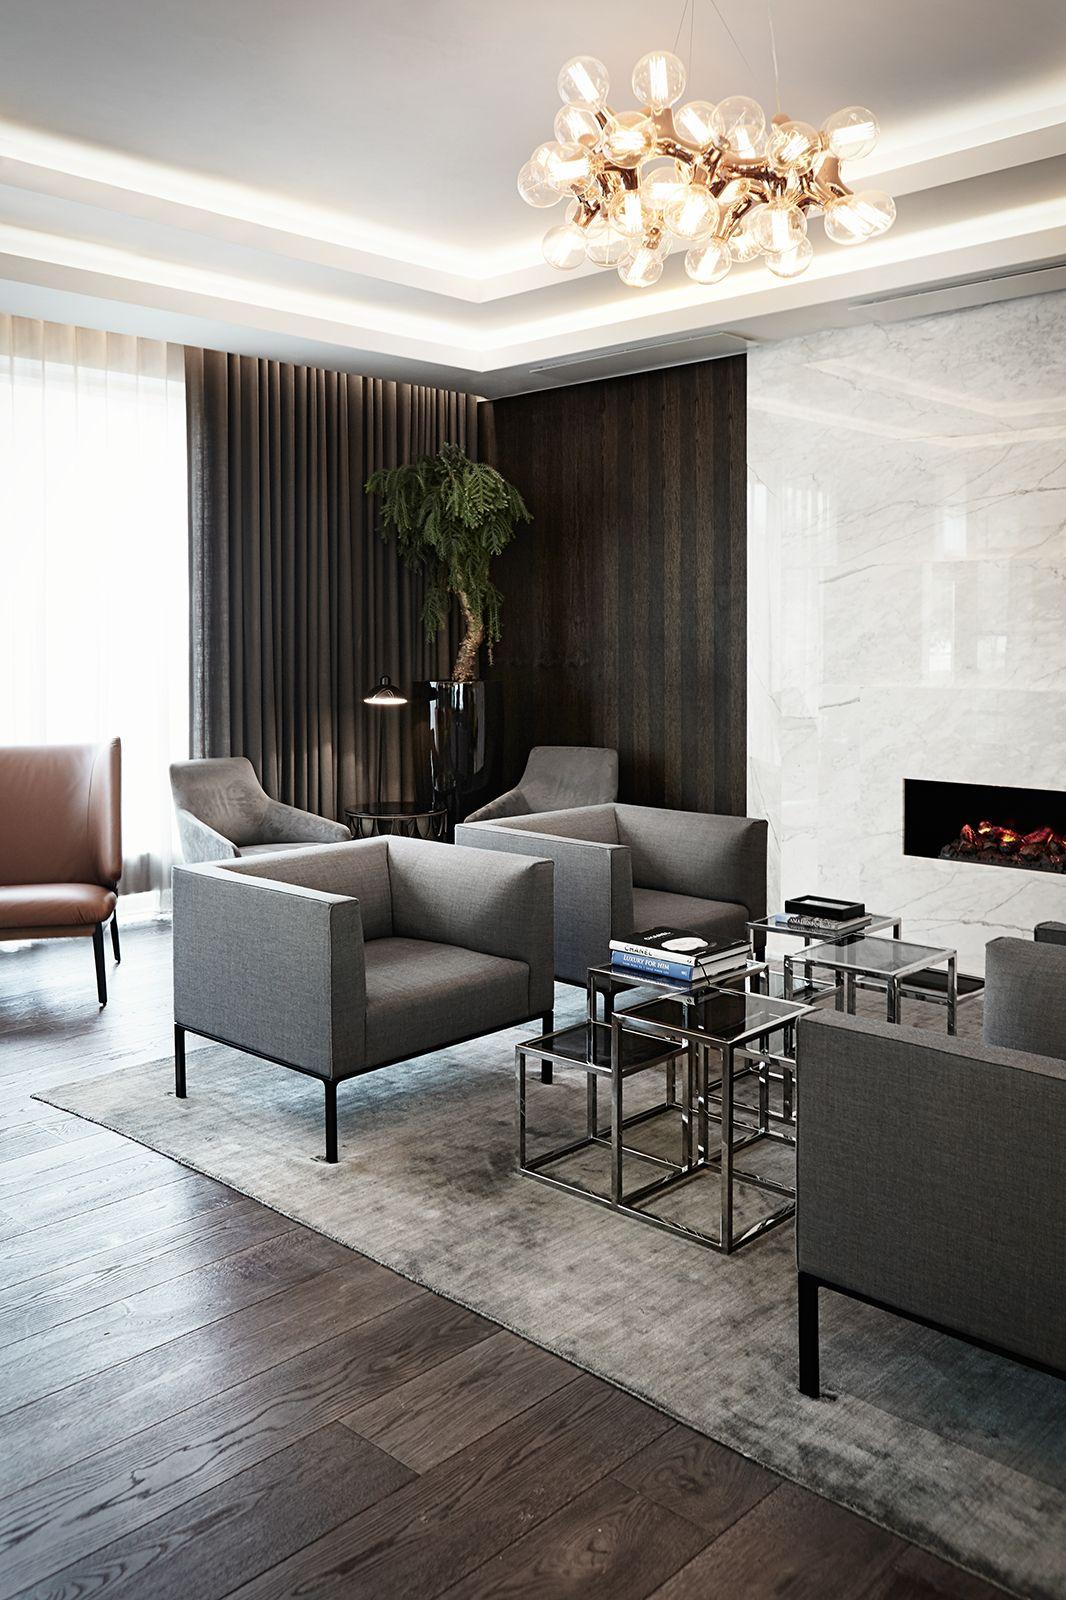 Best Interior Design Of Living Room: This Marriott Copenhagen, Executive Lounge Interiors Can